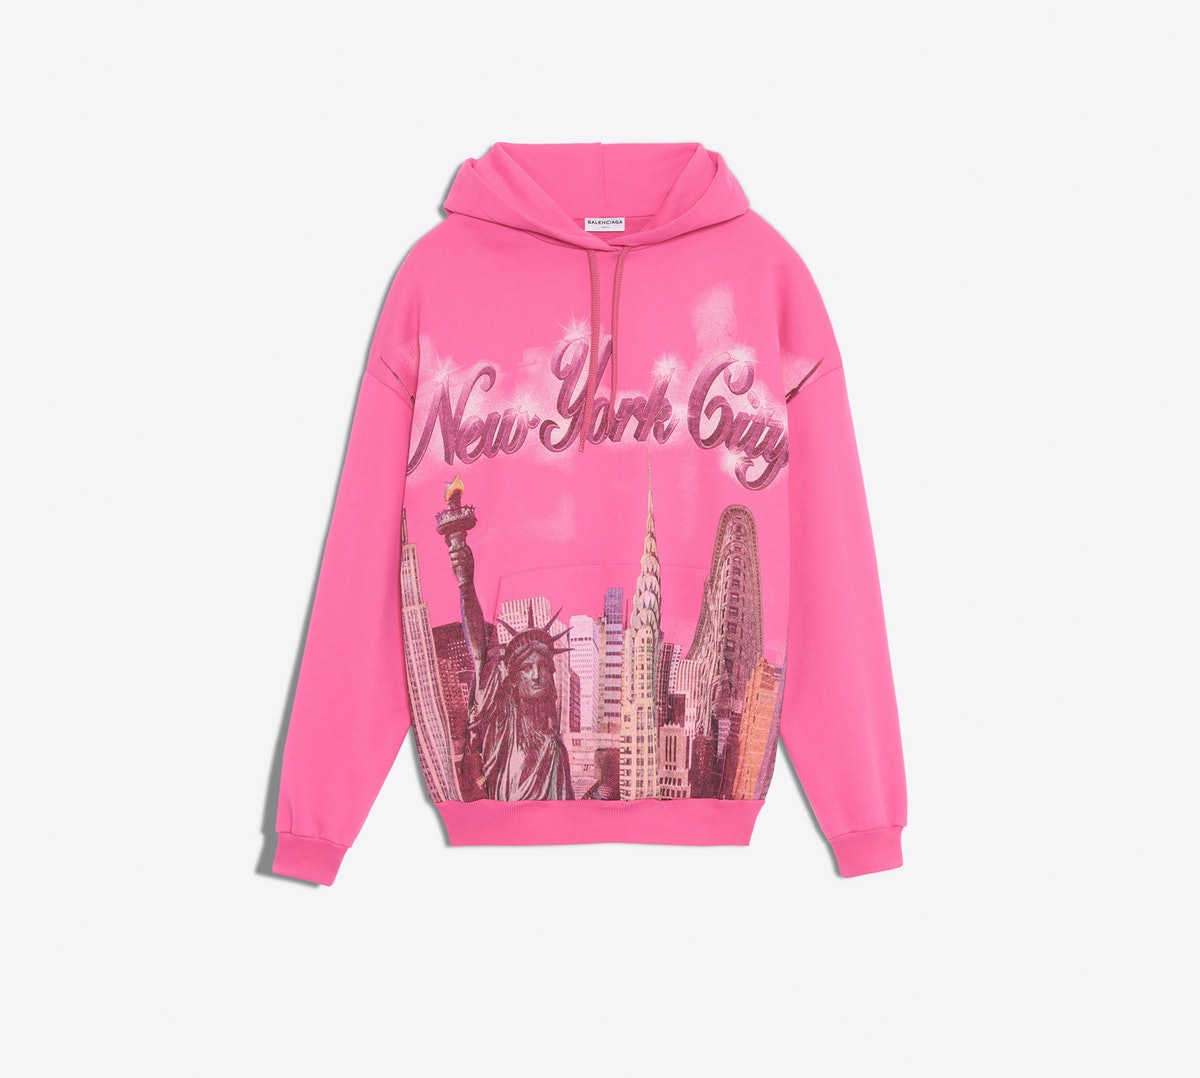 Balenciaga New York Hoodie Sweater